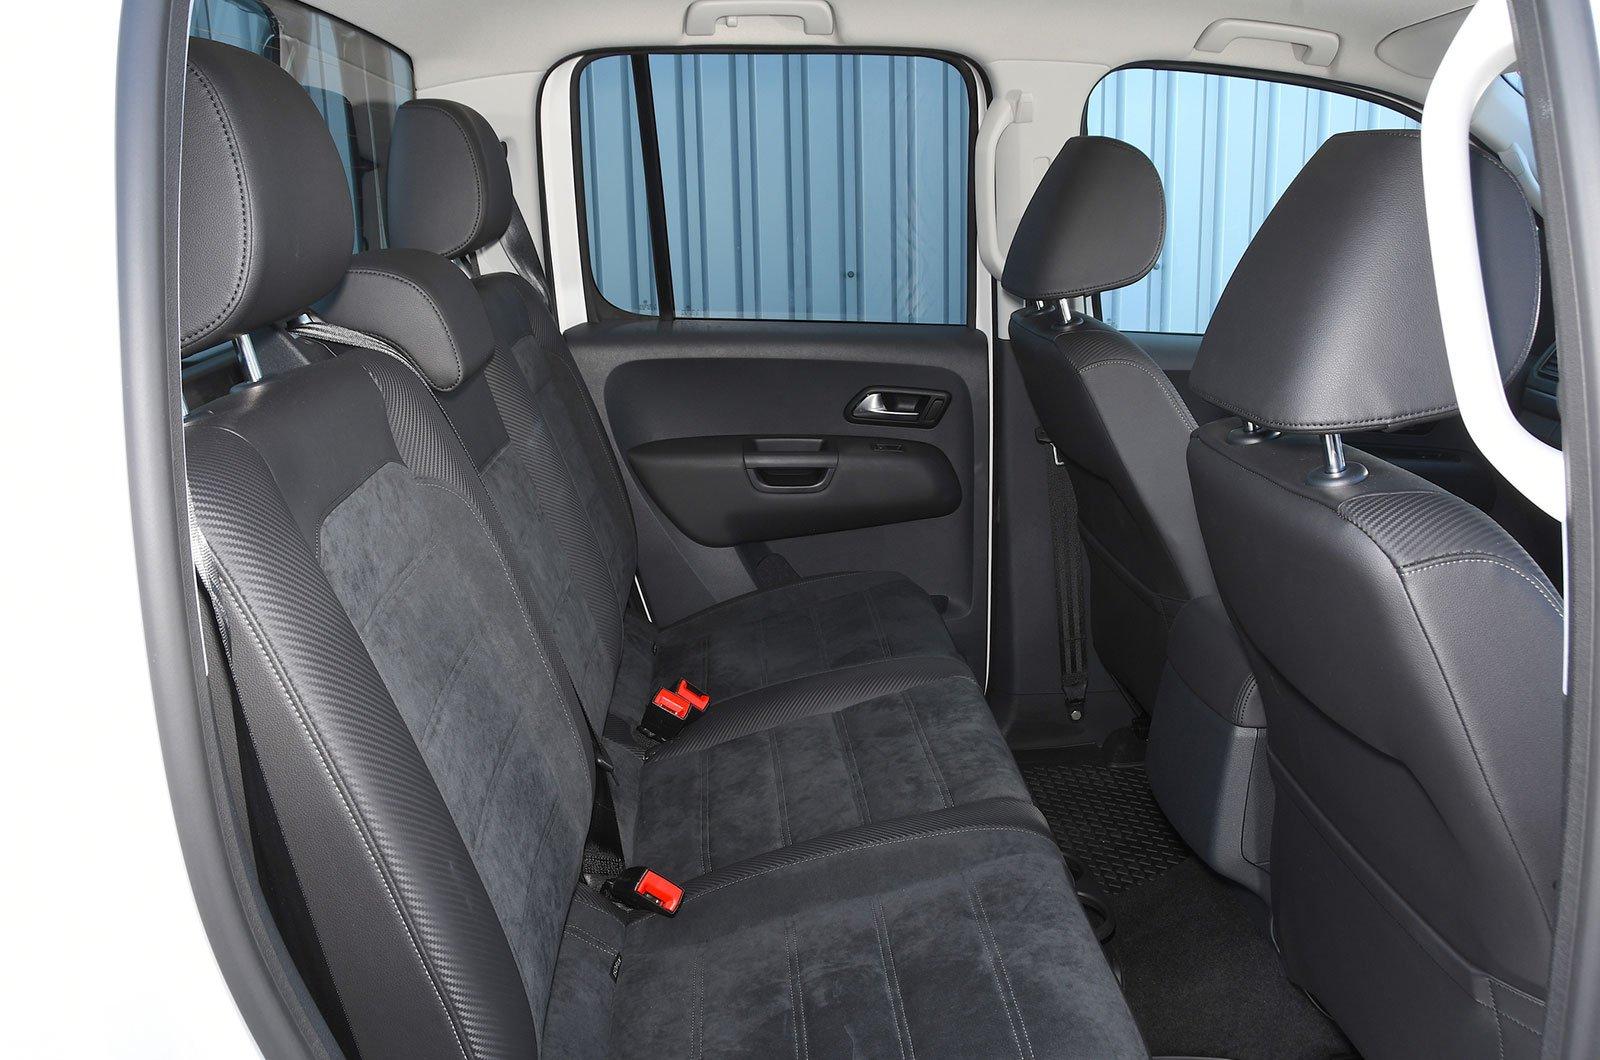 Volkswagen Amarok rear seats